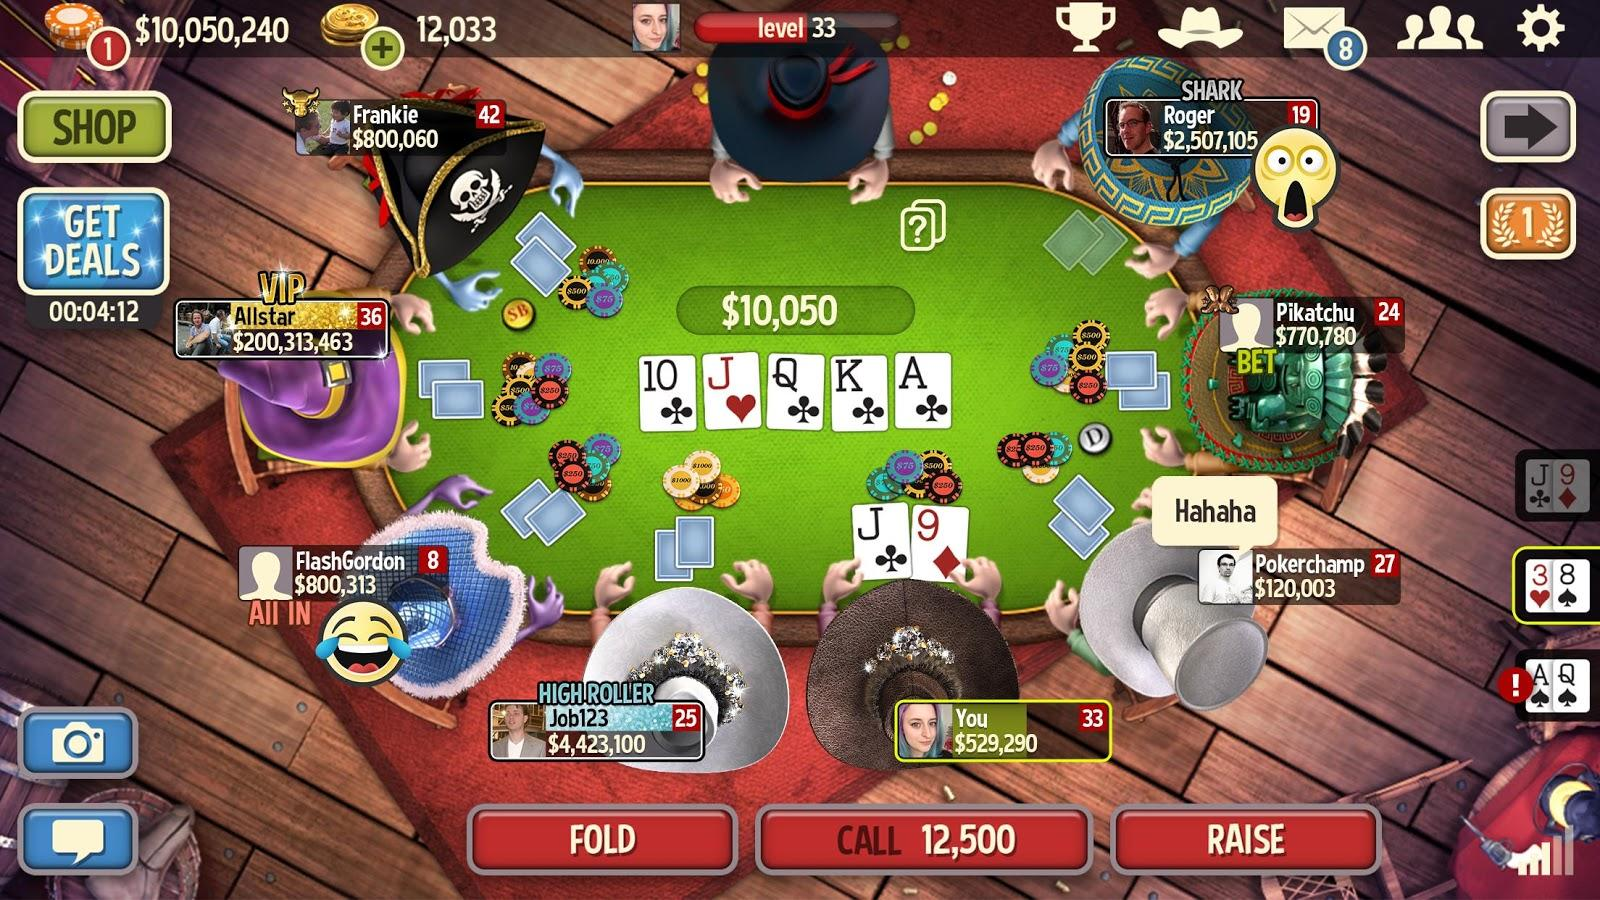 Governor of Poker 3 скачать 4.6.0 APK на Android